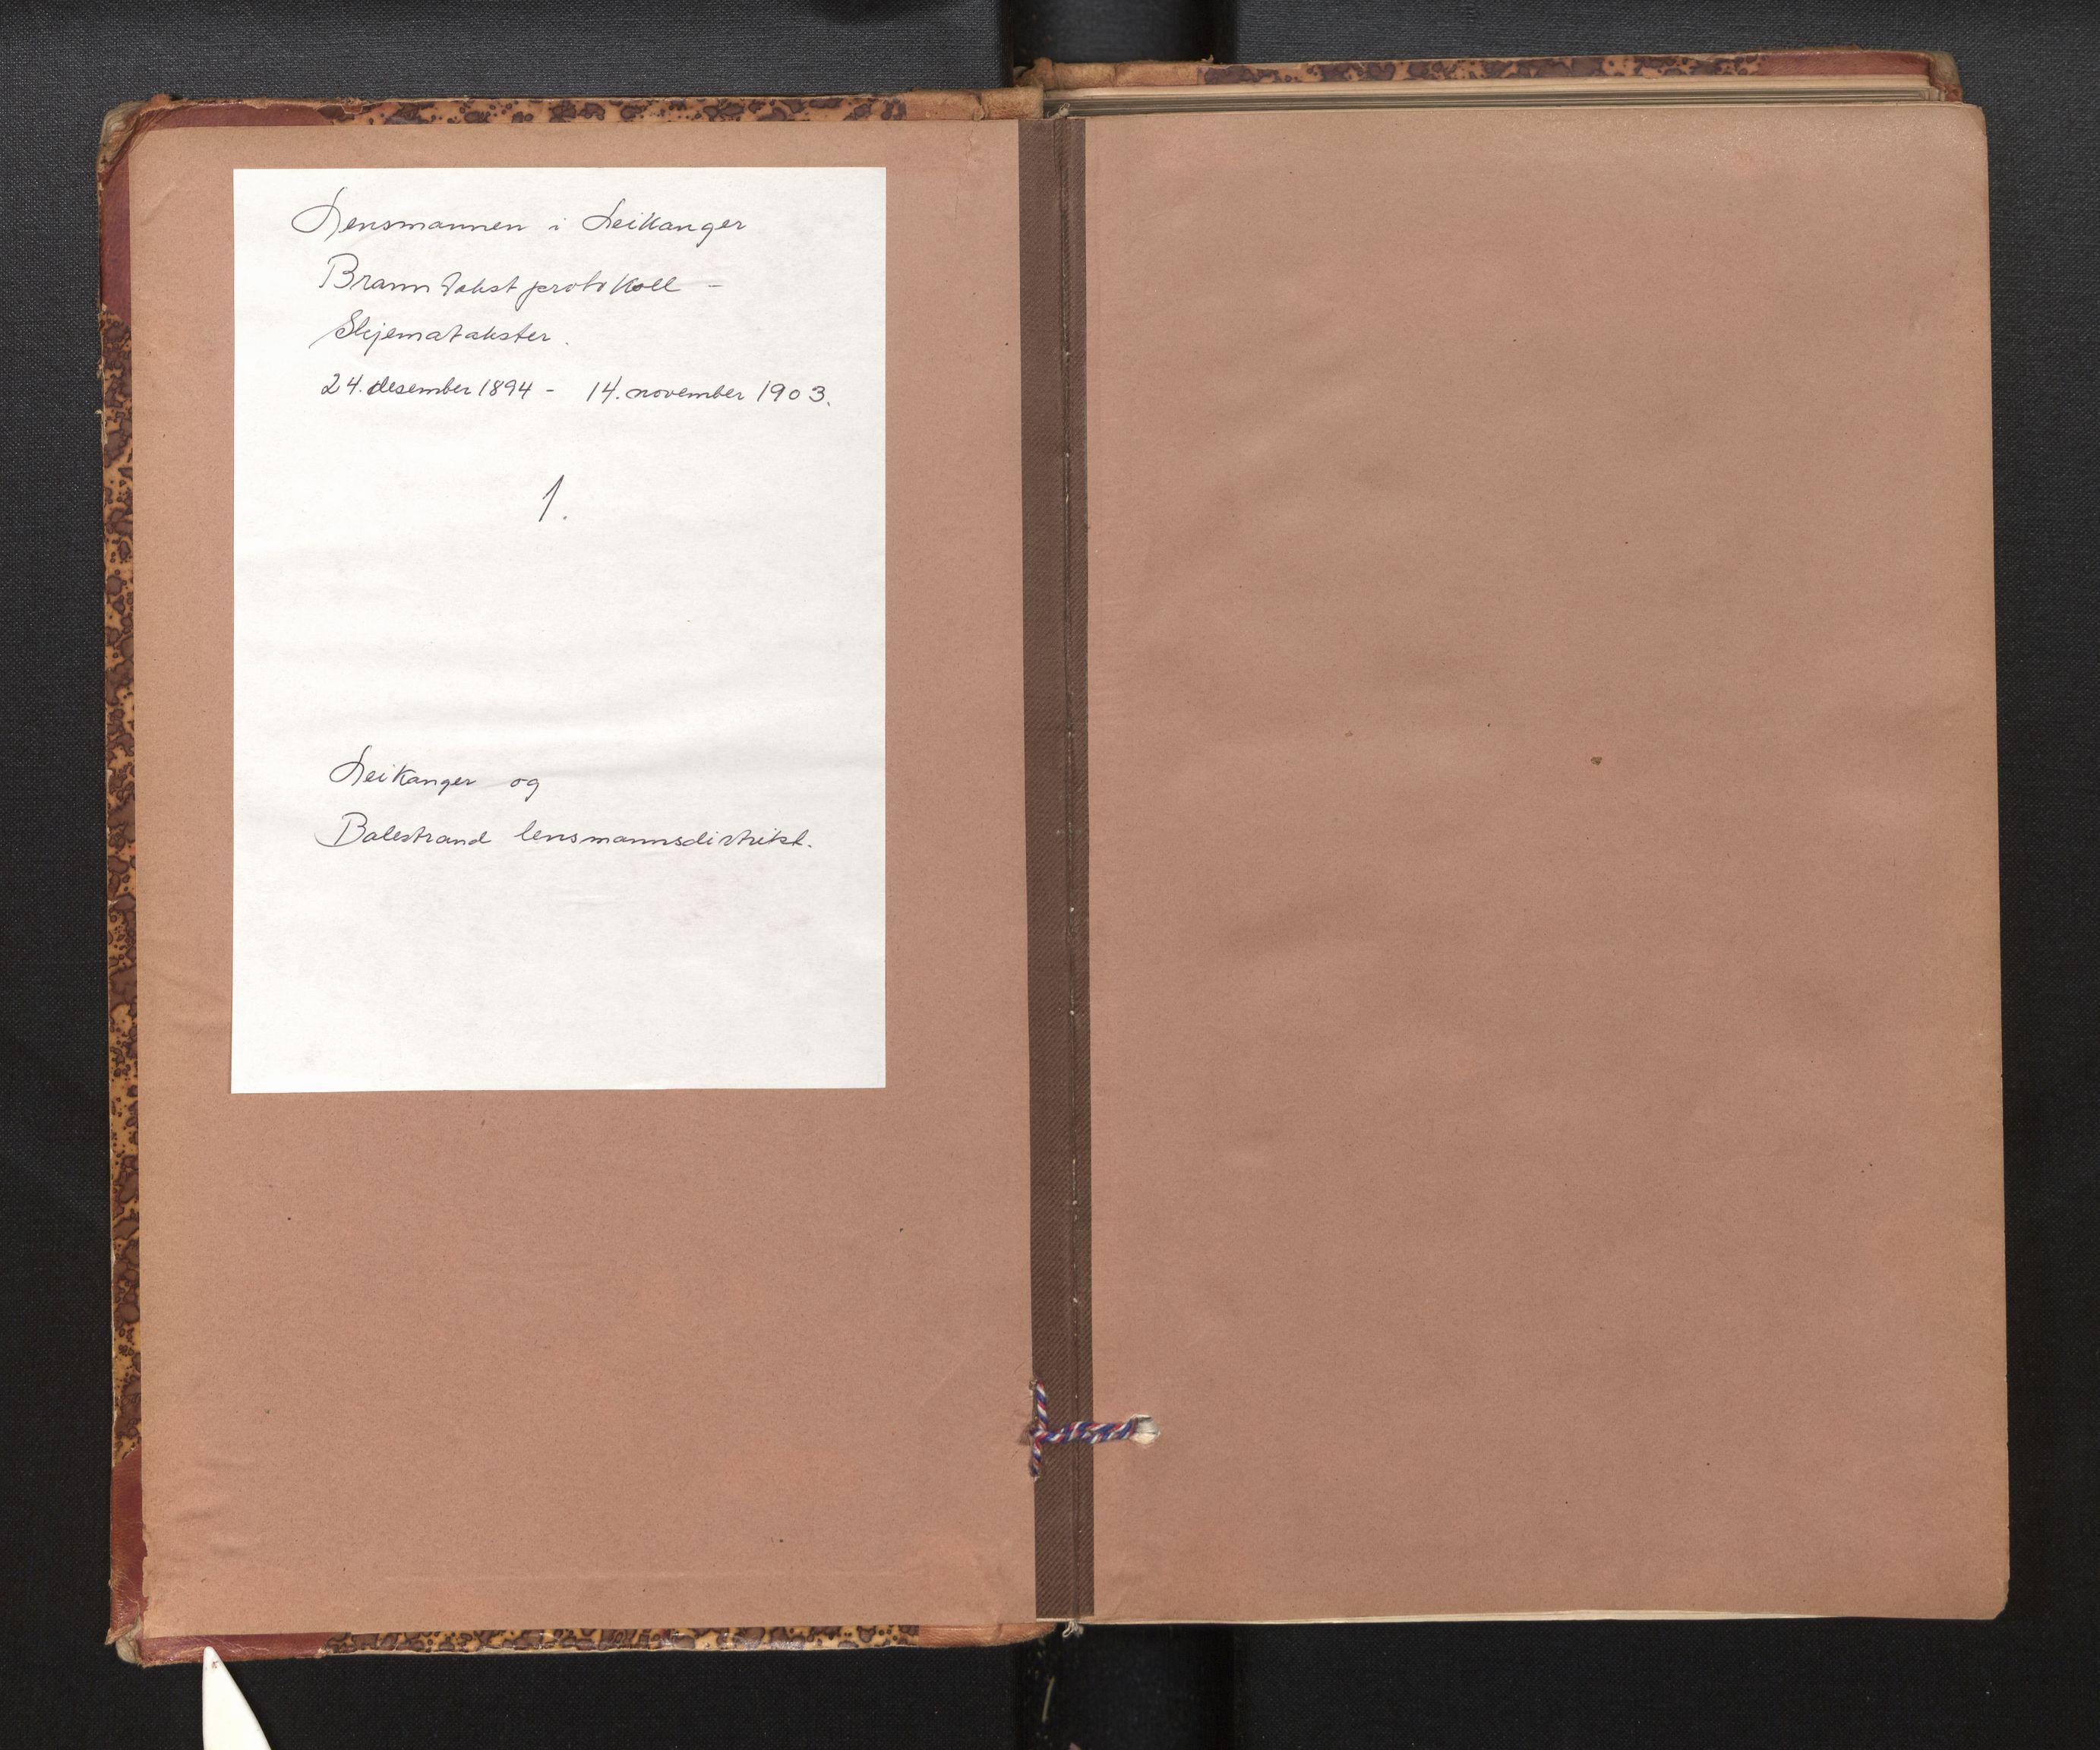 SAB, Lensmannen i Leikanger, 0012/L0004: Branntakstprotokoll, skjematakst, 1894-1903